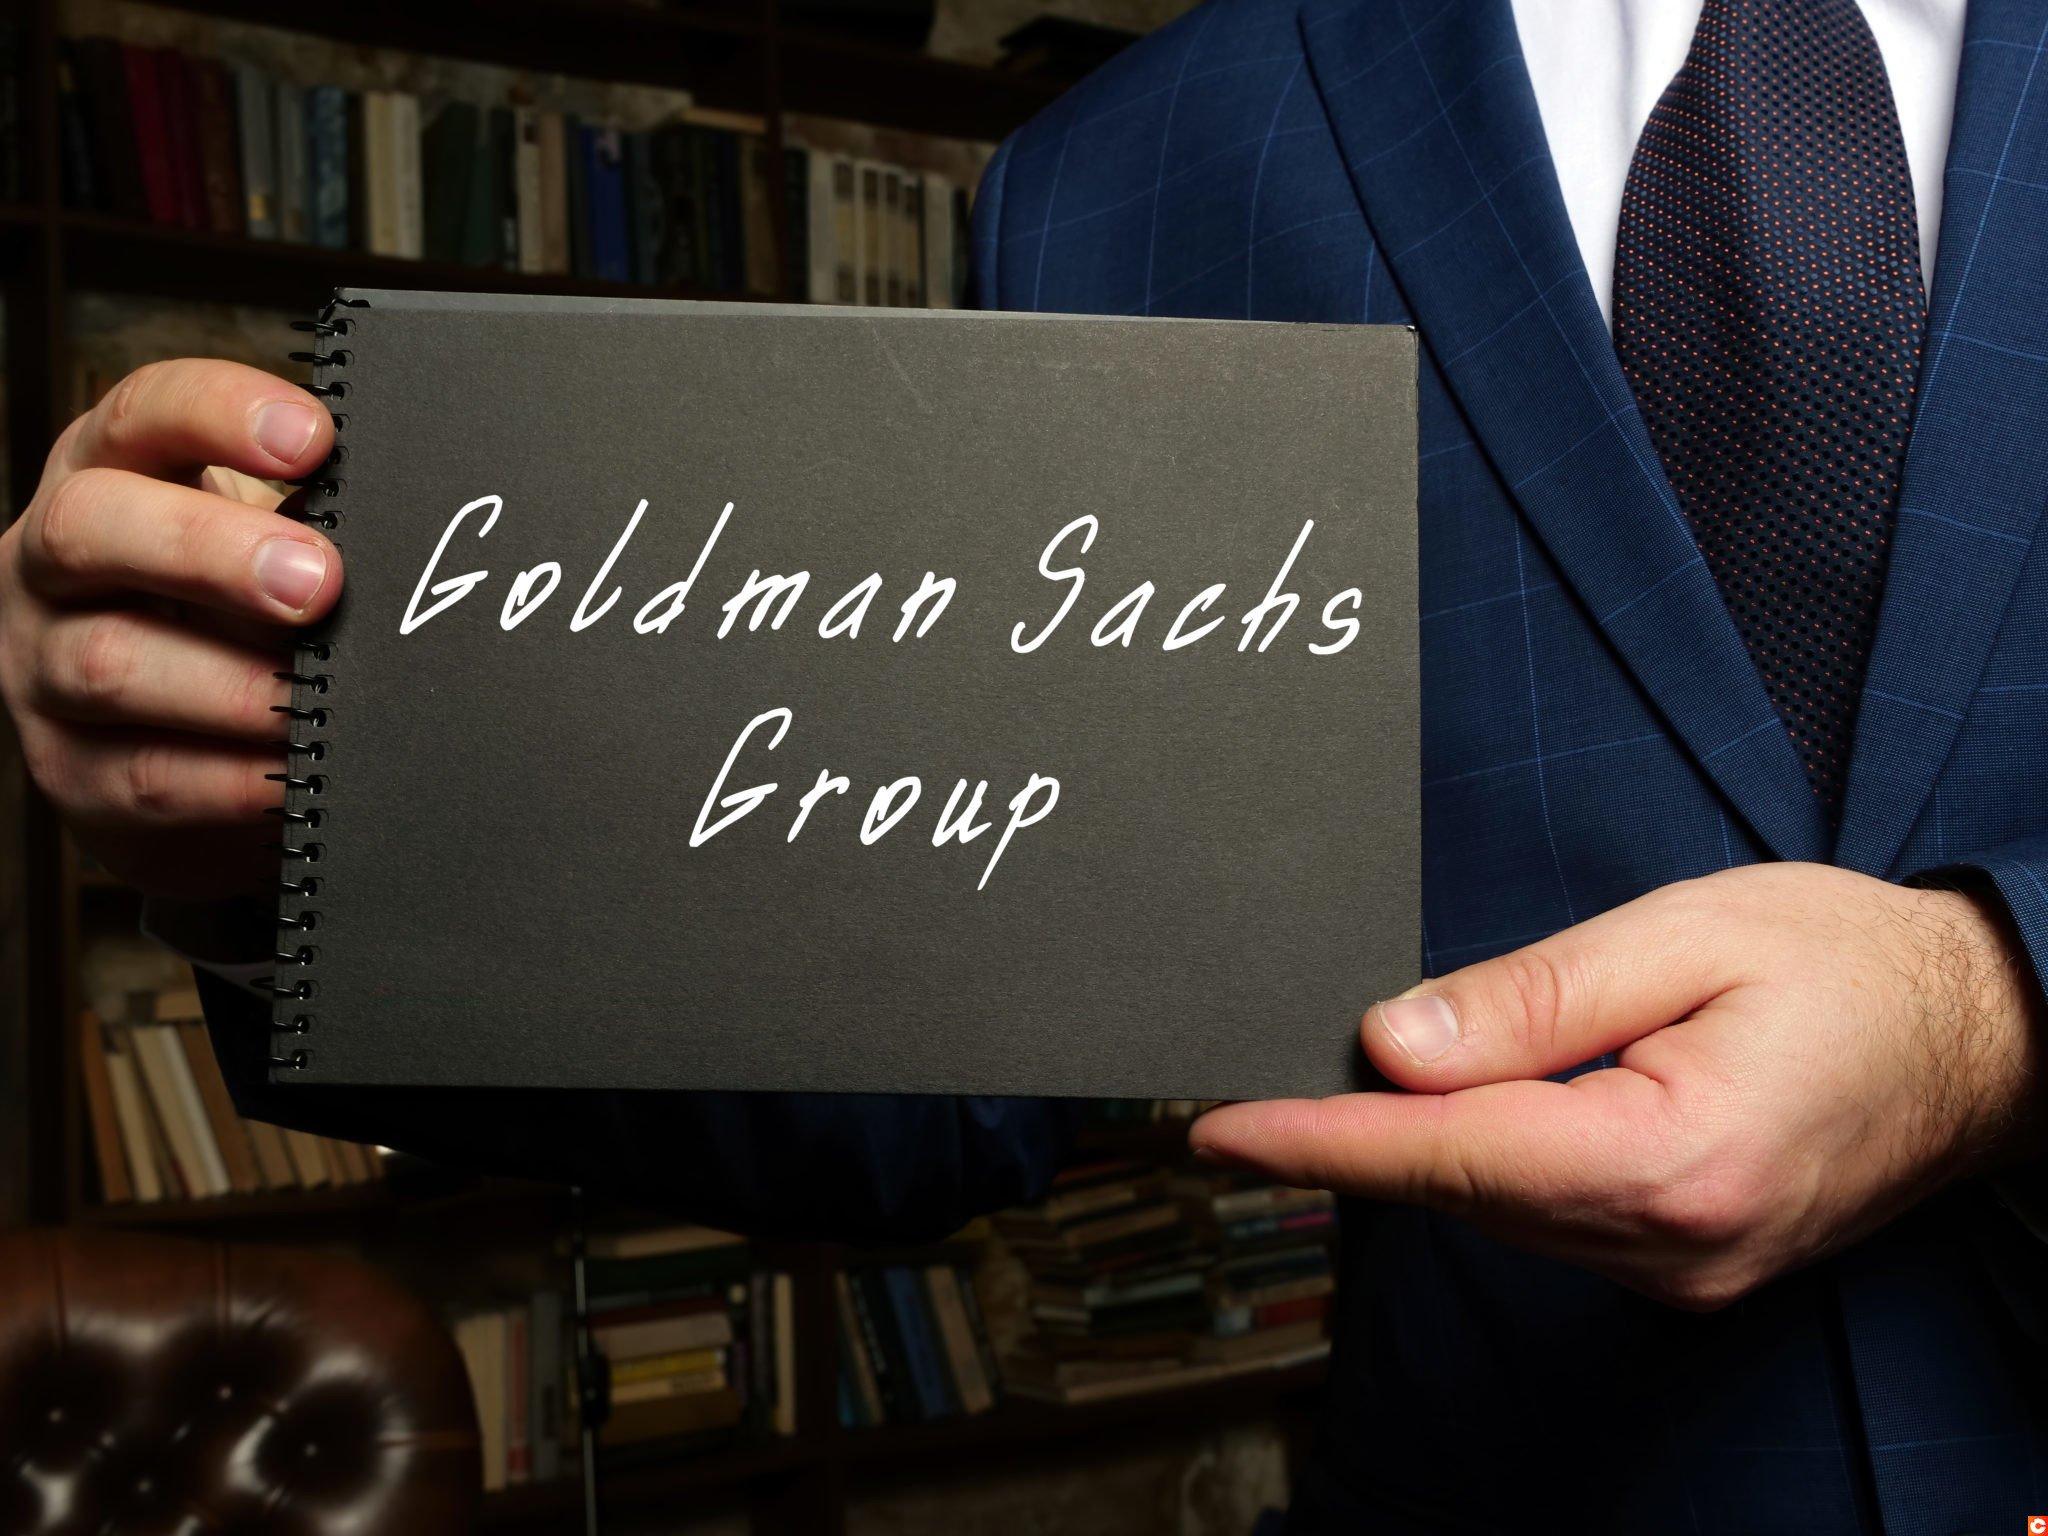 Goldman Sachs Group inscription on the black notepad